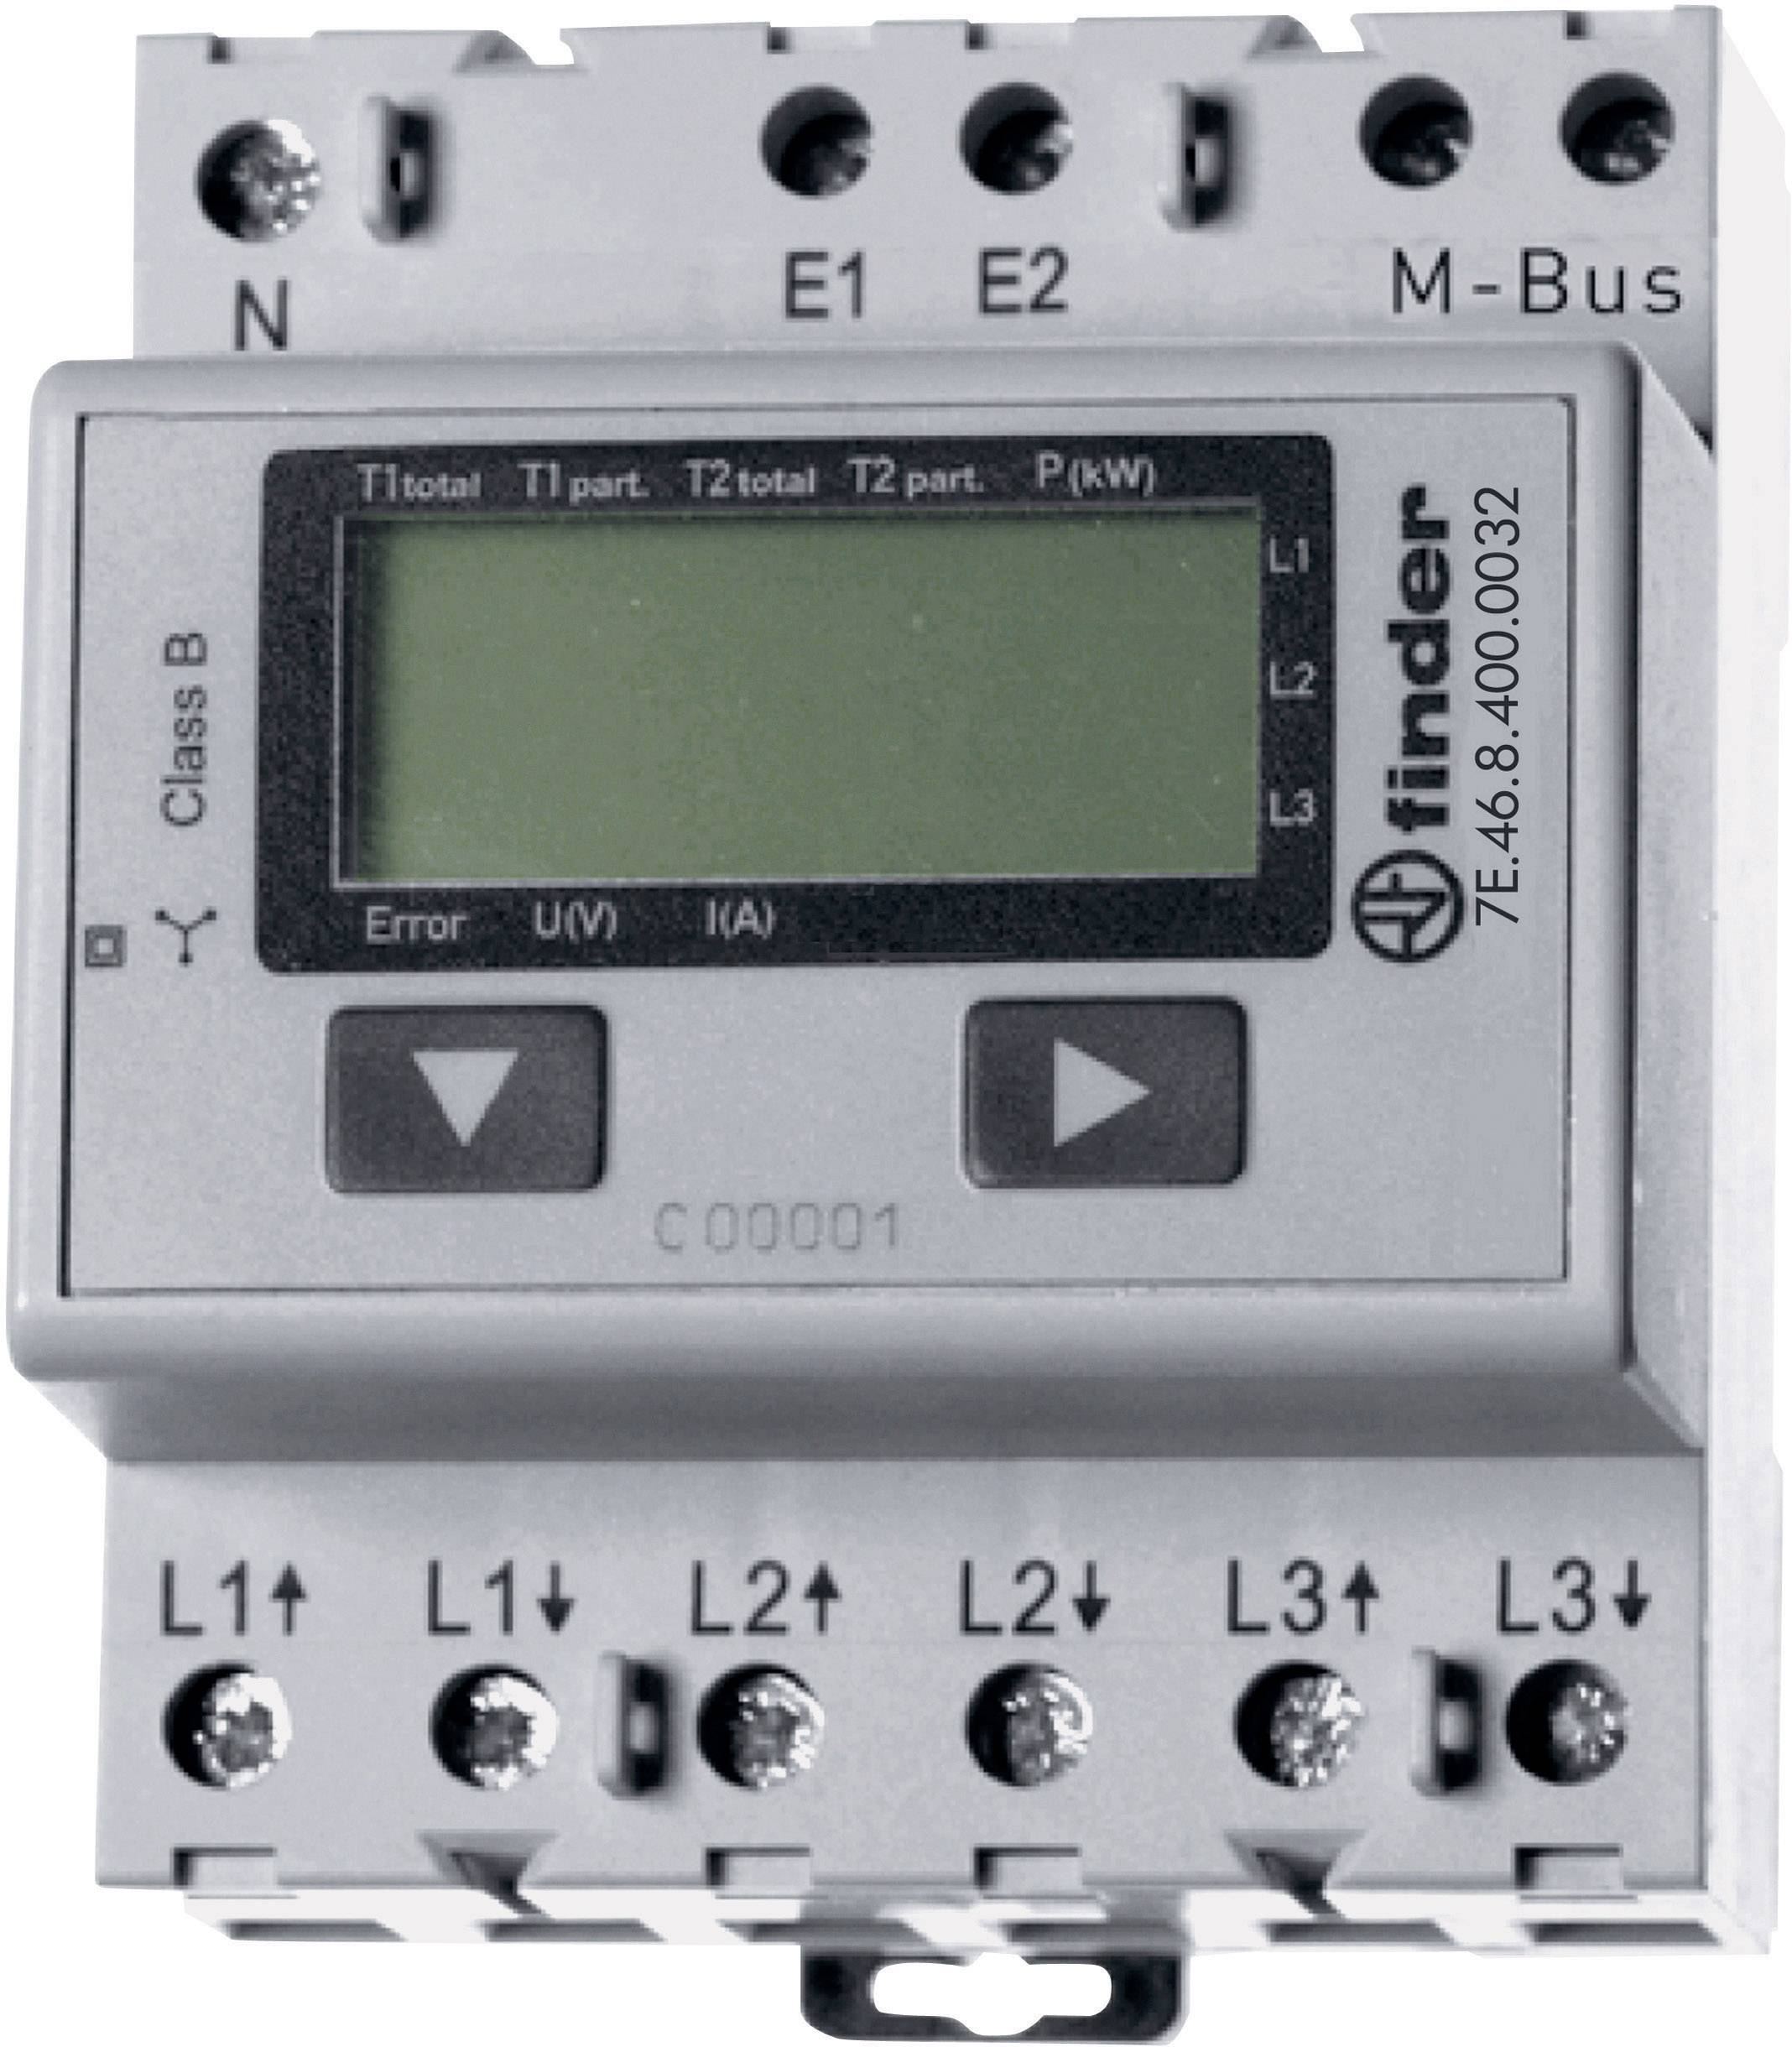 Trojfázový elektromer digitálne/y Finder 7E.46.8.400.0032 7E.46.8.400.0032, 65 A